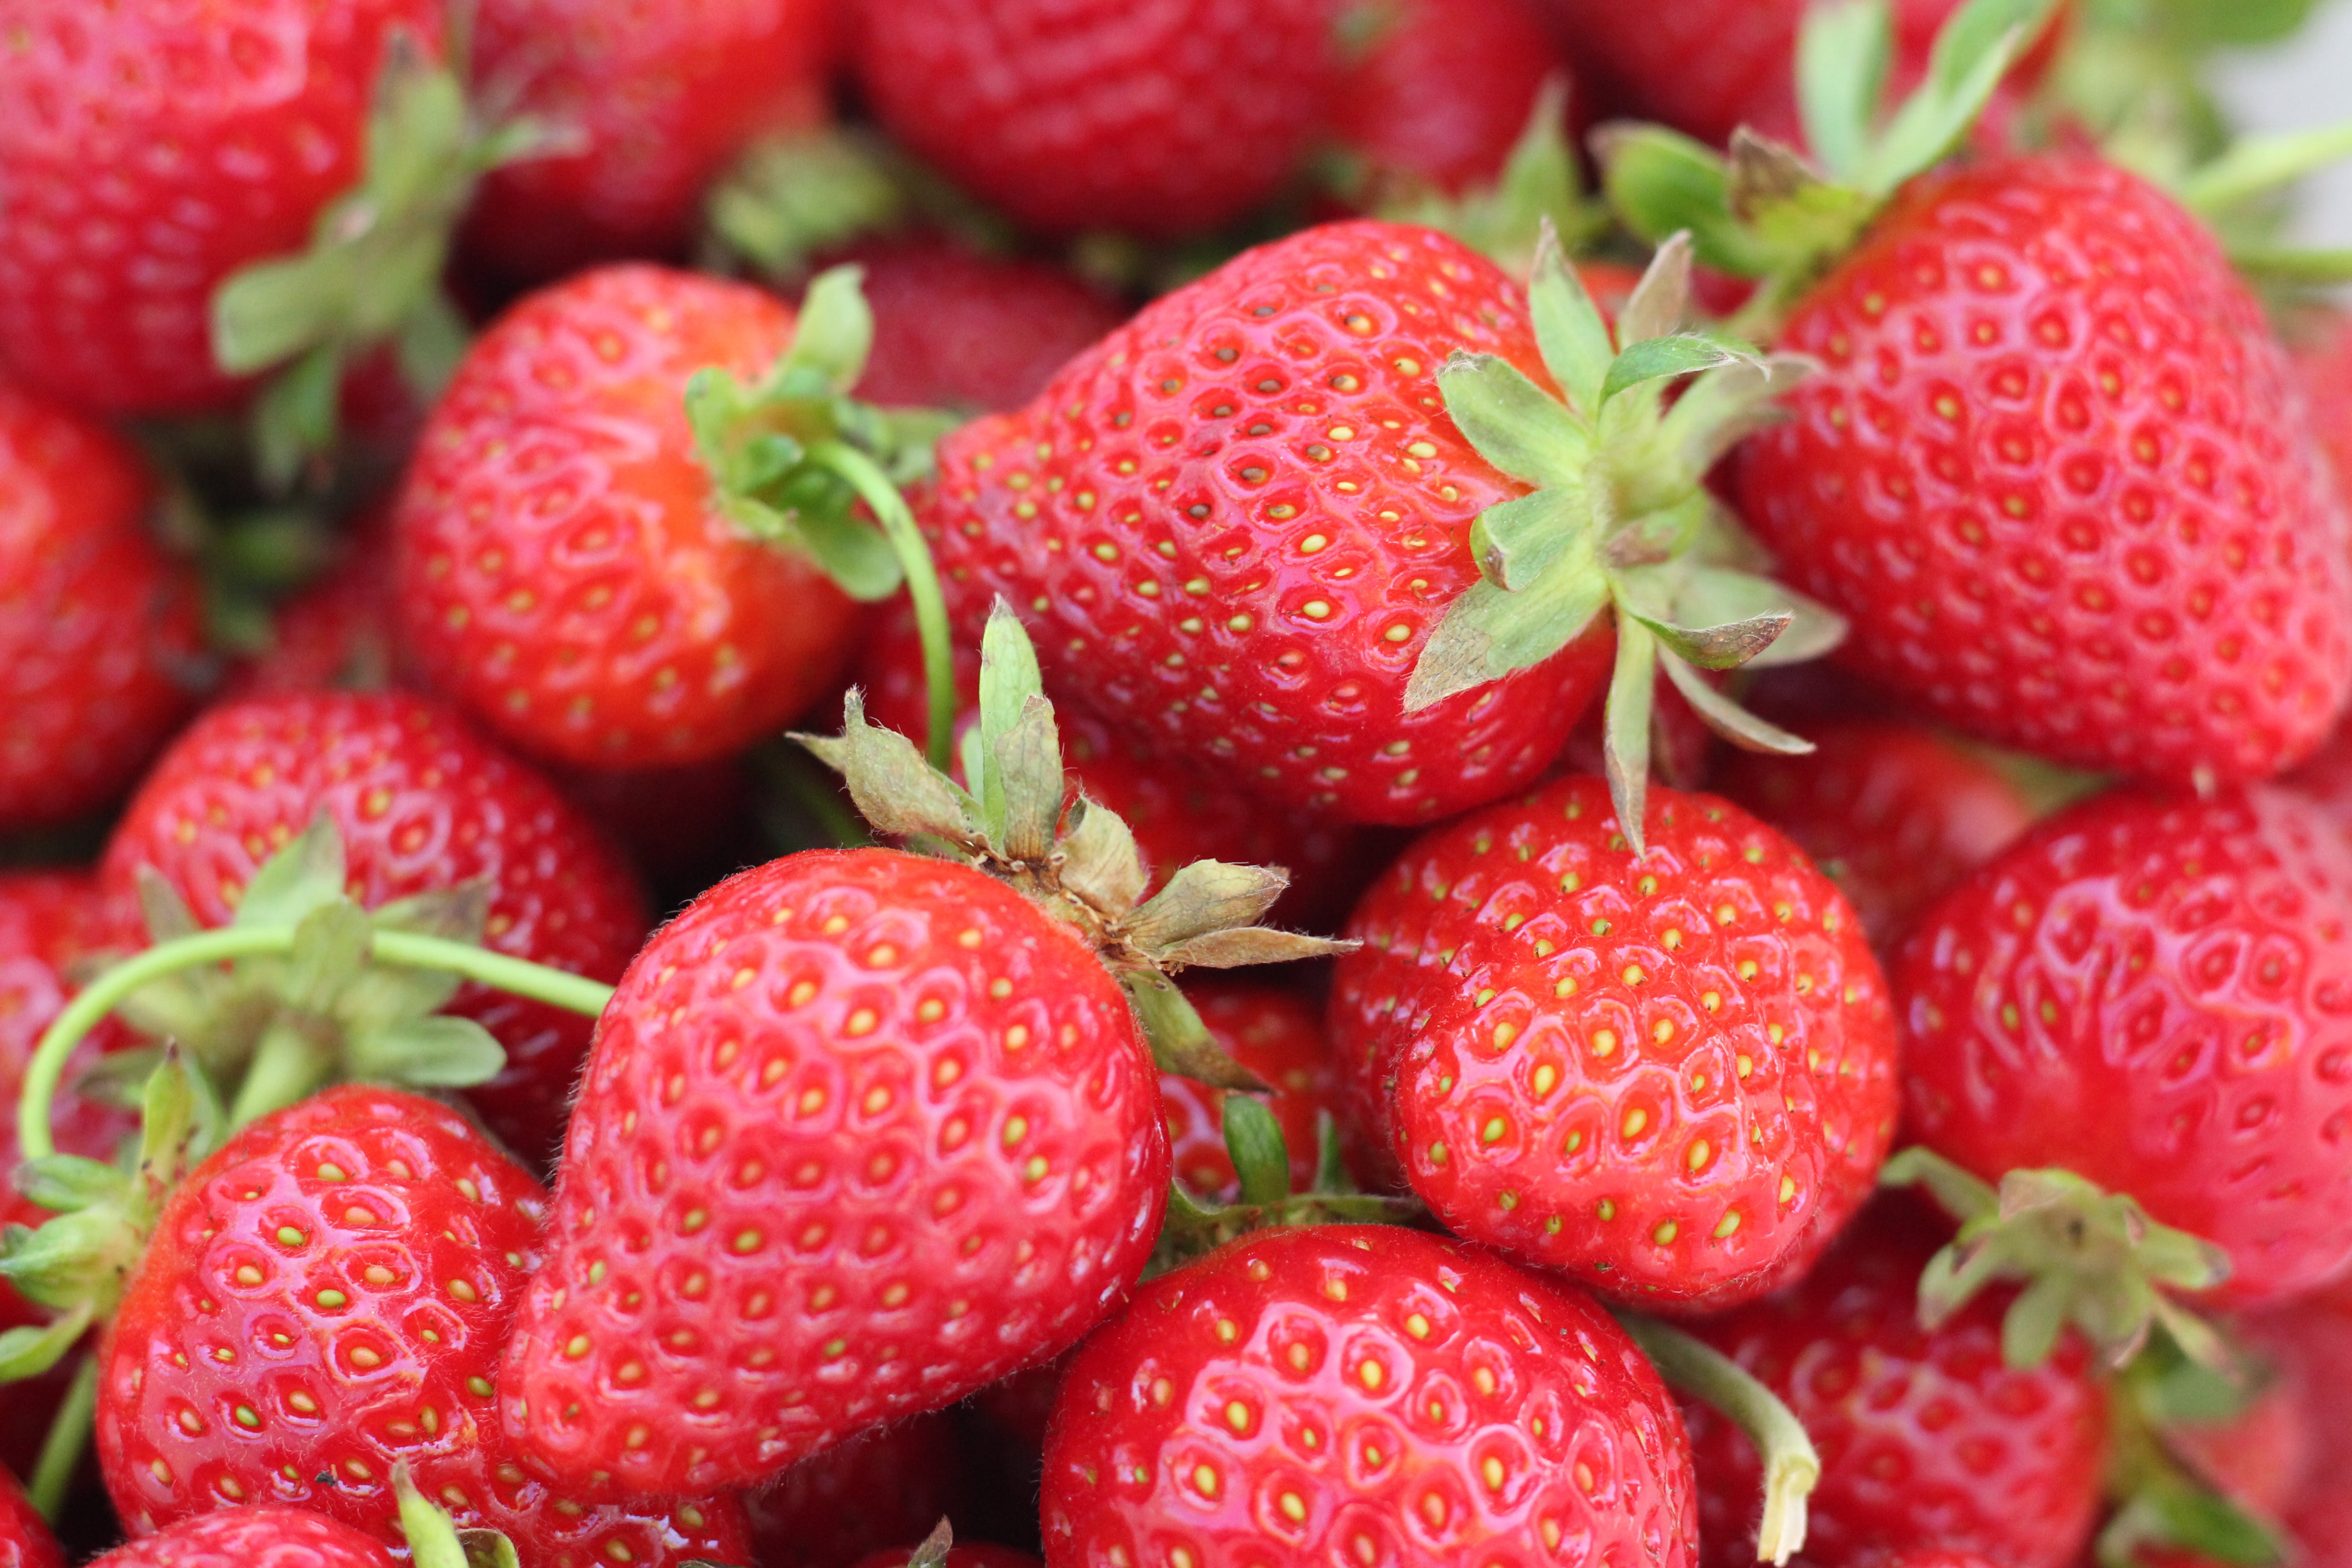 Strawberry Close Up Photo